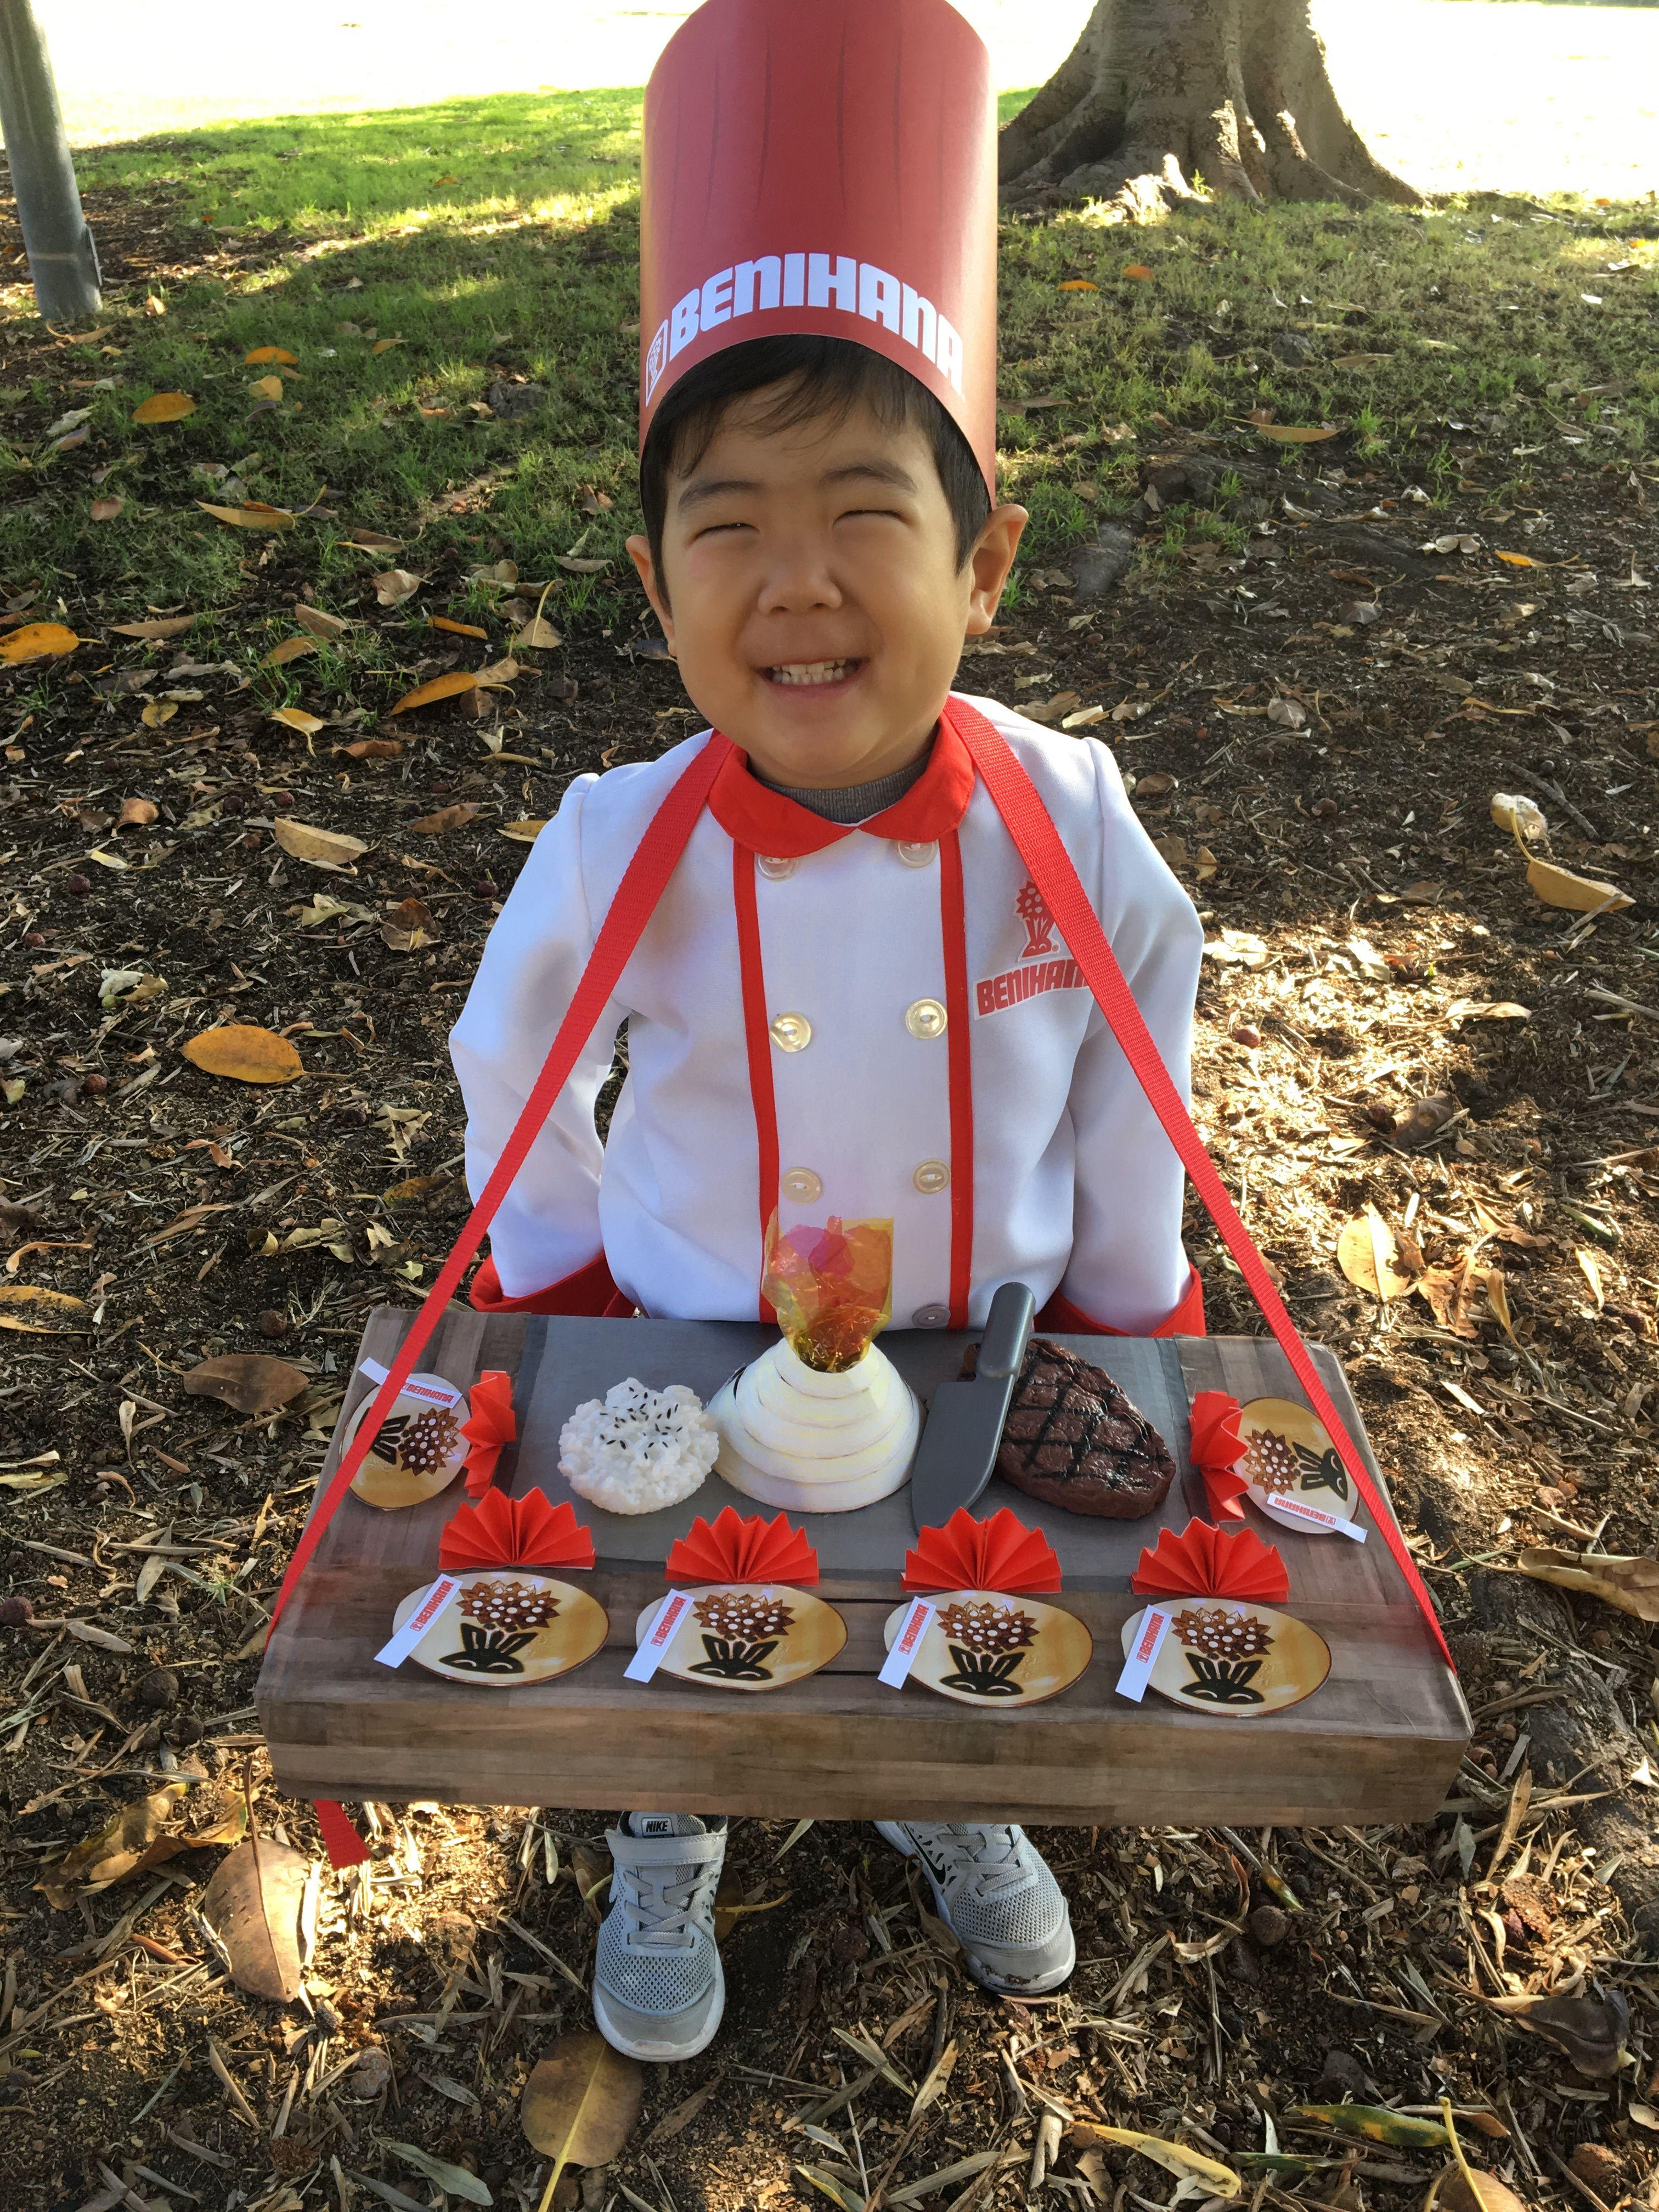 DIY Benihana chef costume toddler kid hibachi grill | kids halloween